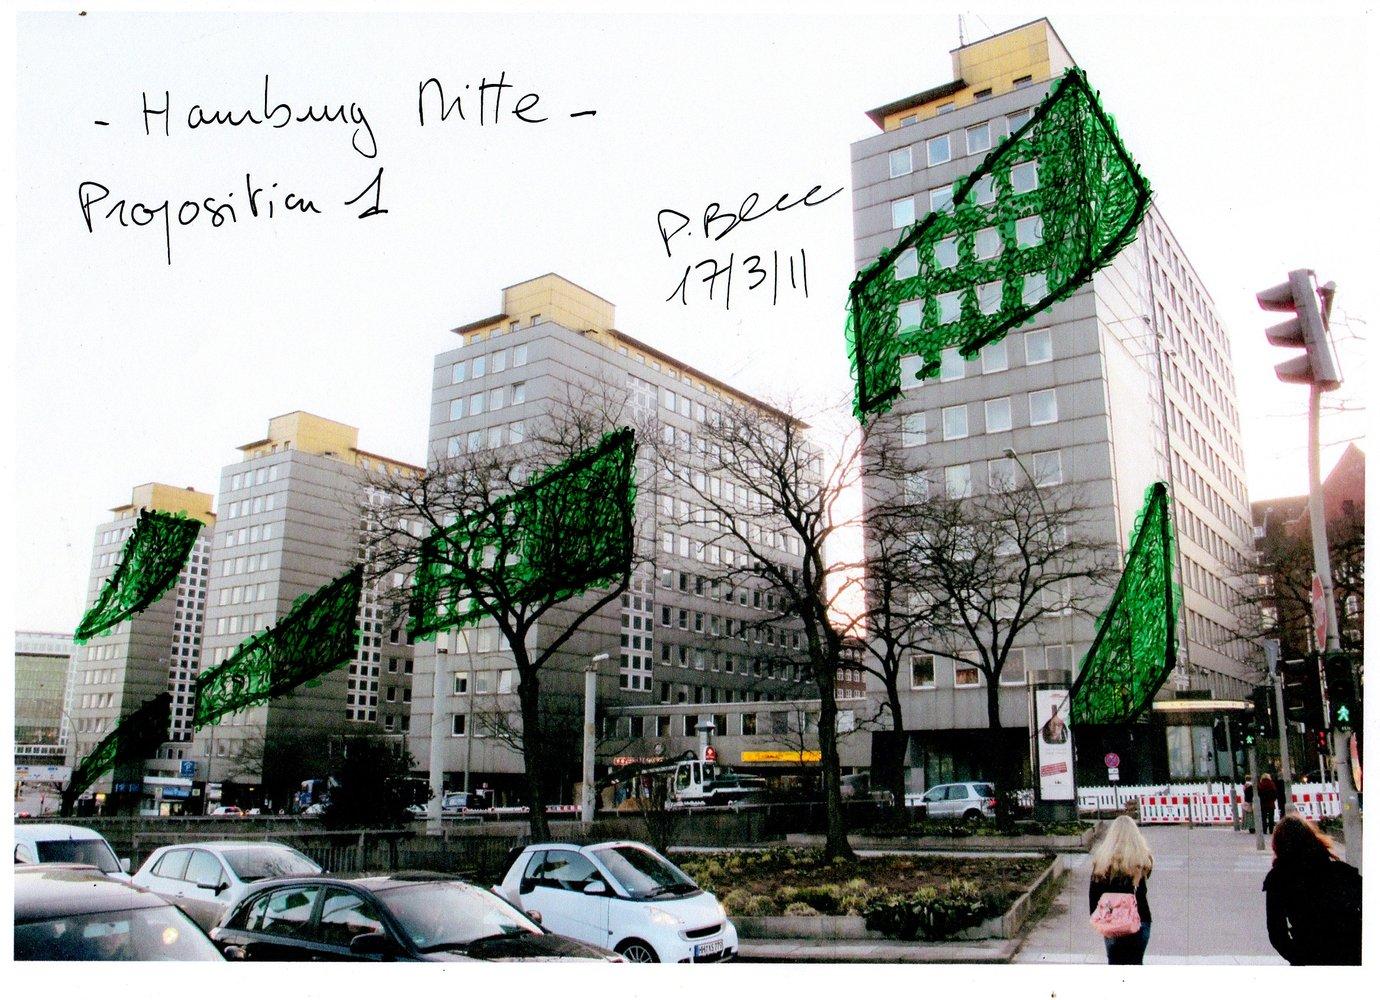 Hamburg mitte mur vegetal patrick blanc - Mur vegetal patrick blanc ...